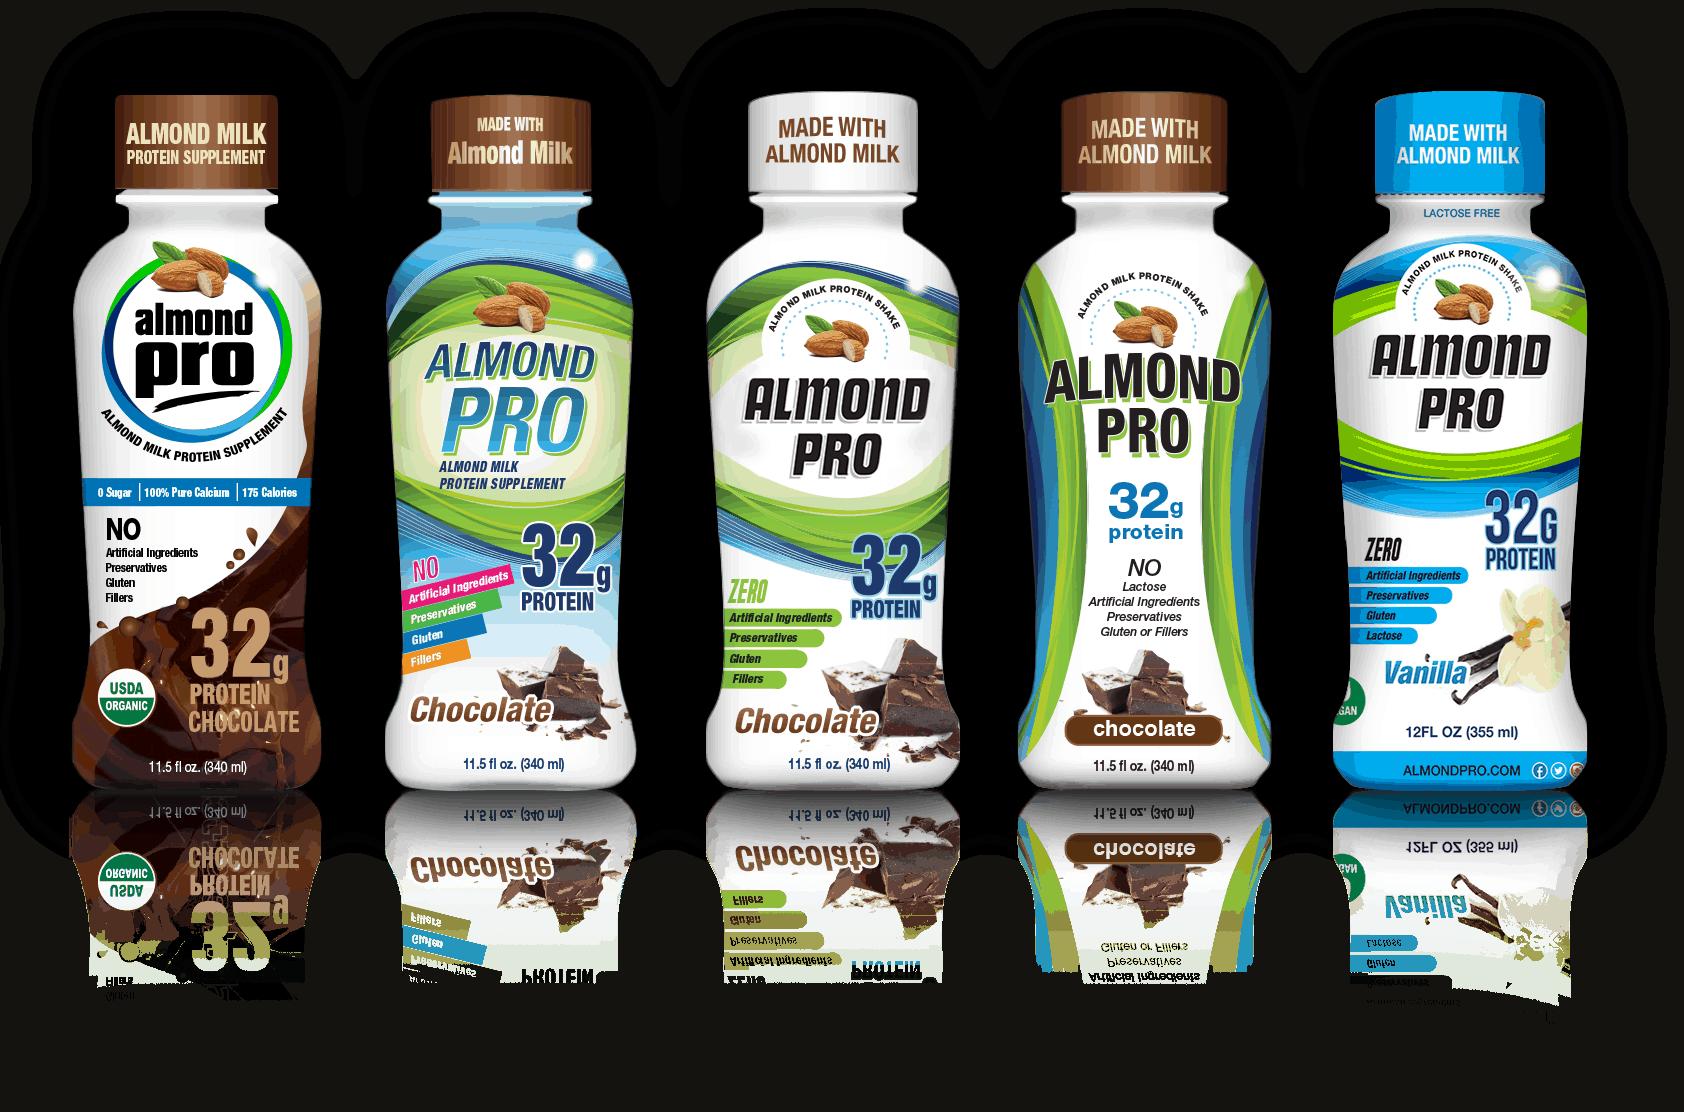 Almondpro-case-study-bottles-retouched